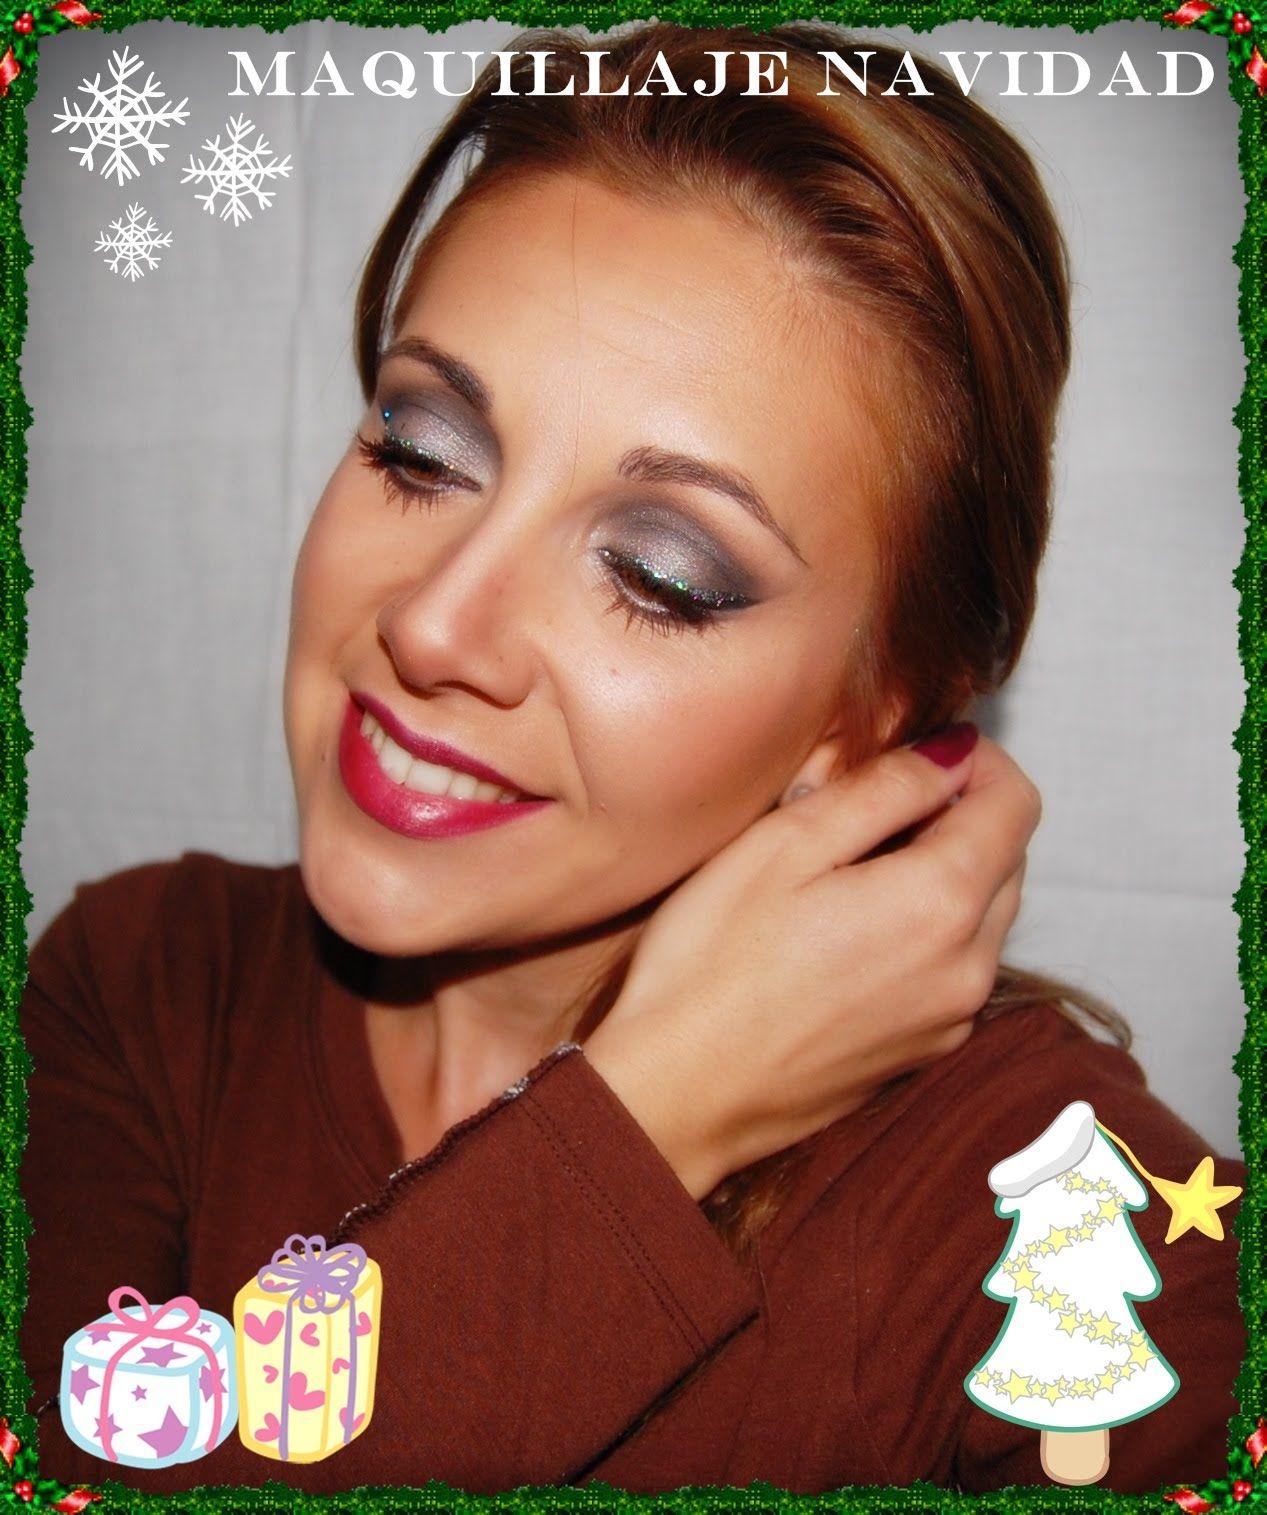 Maquillaje Navidad